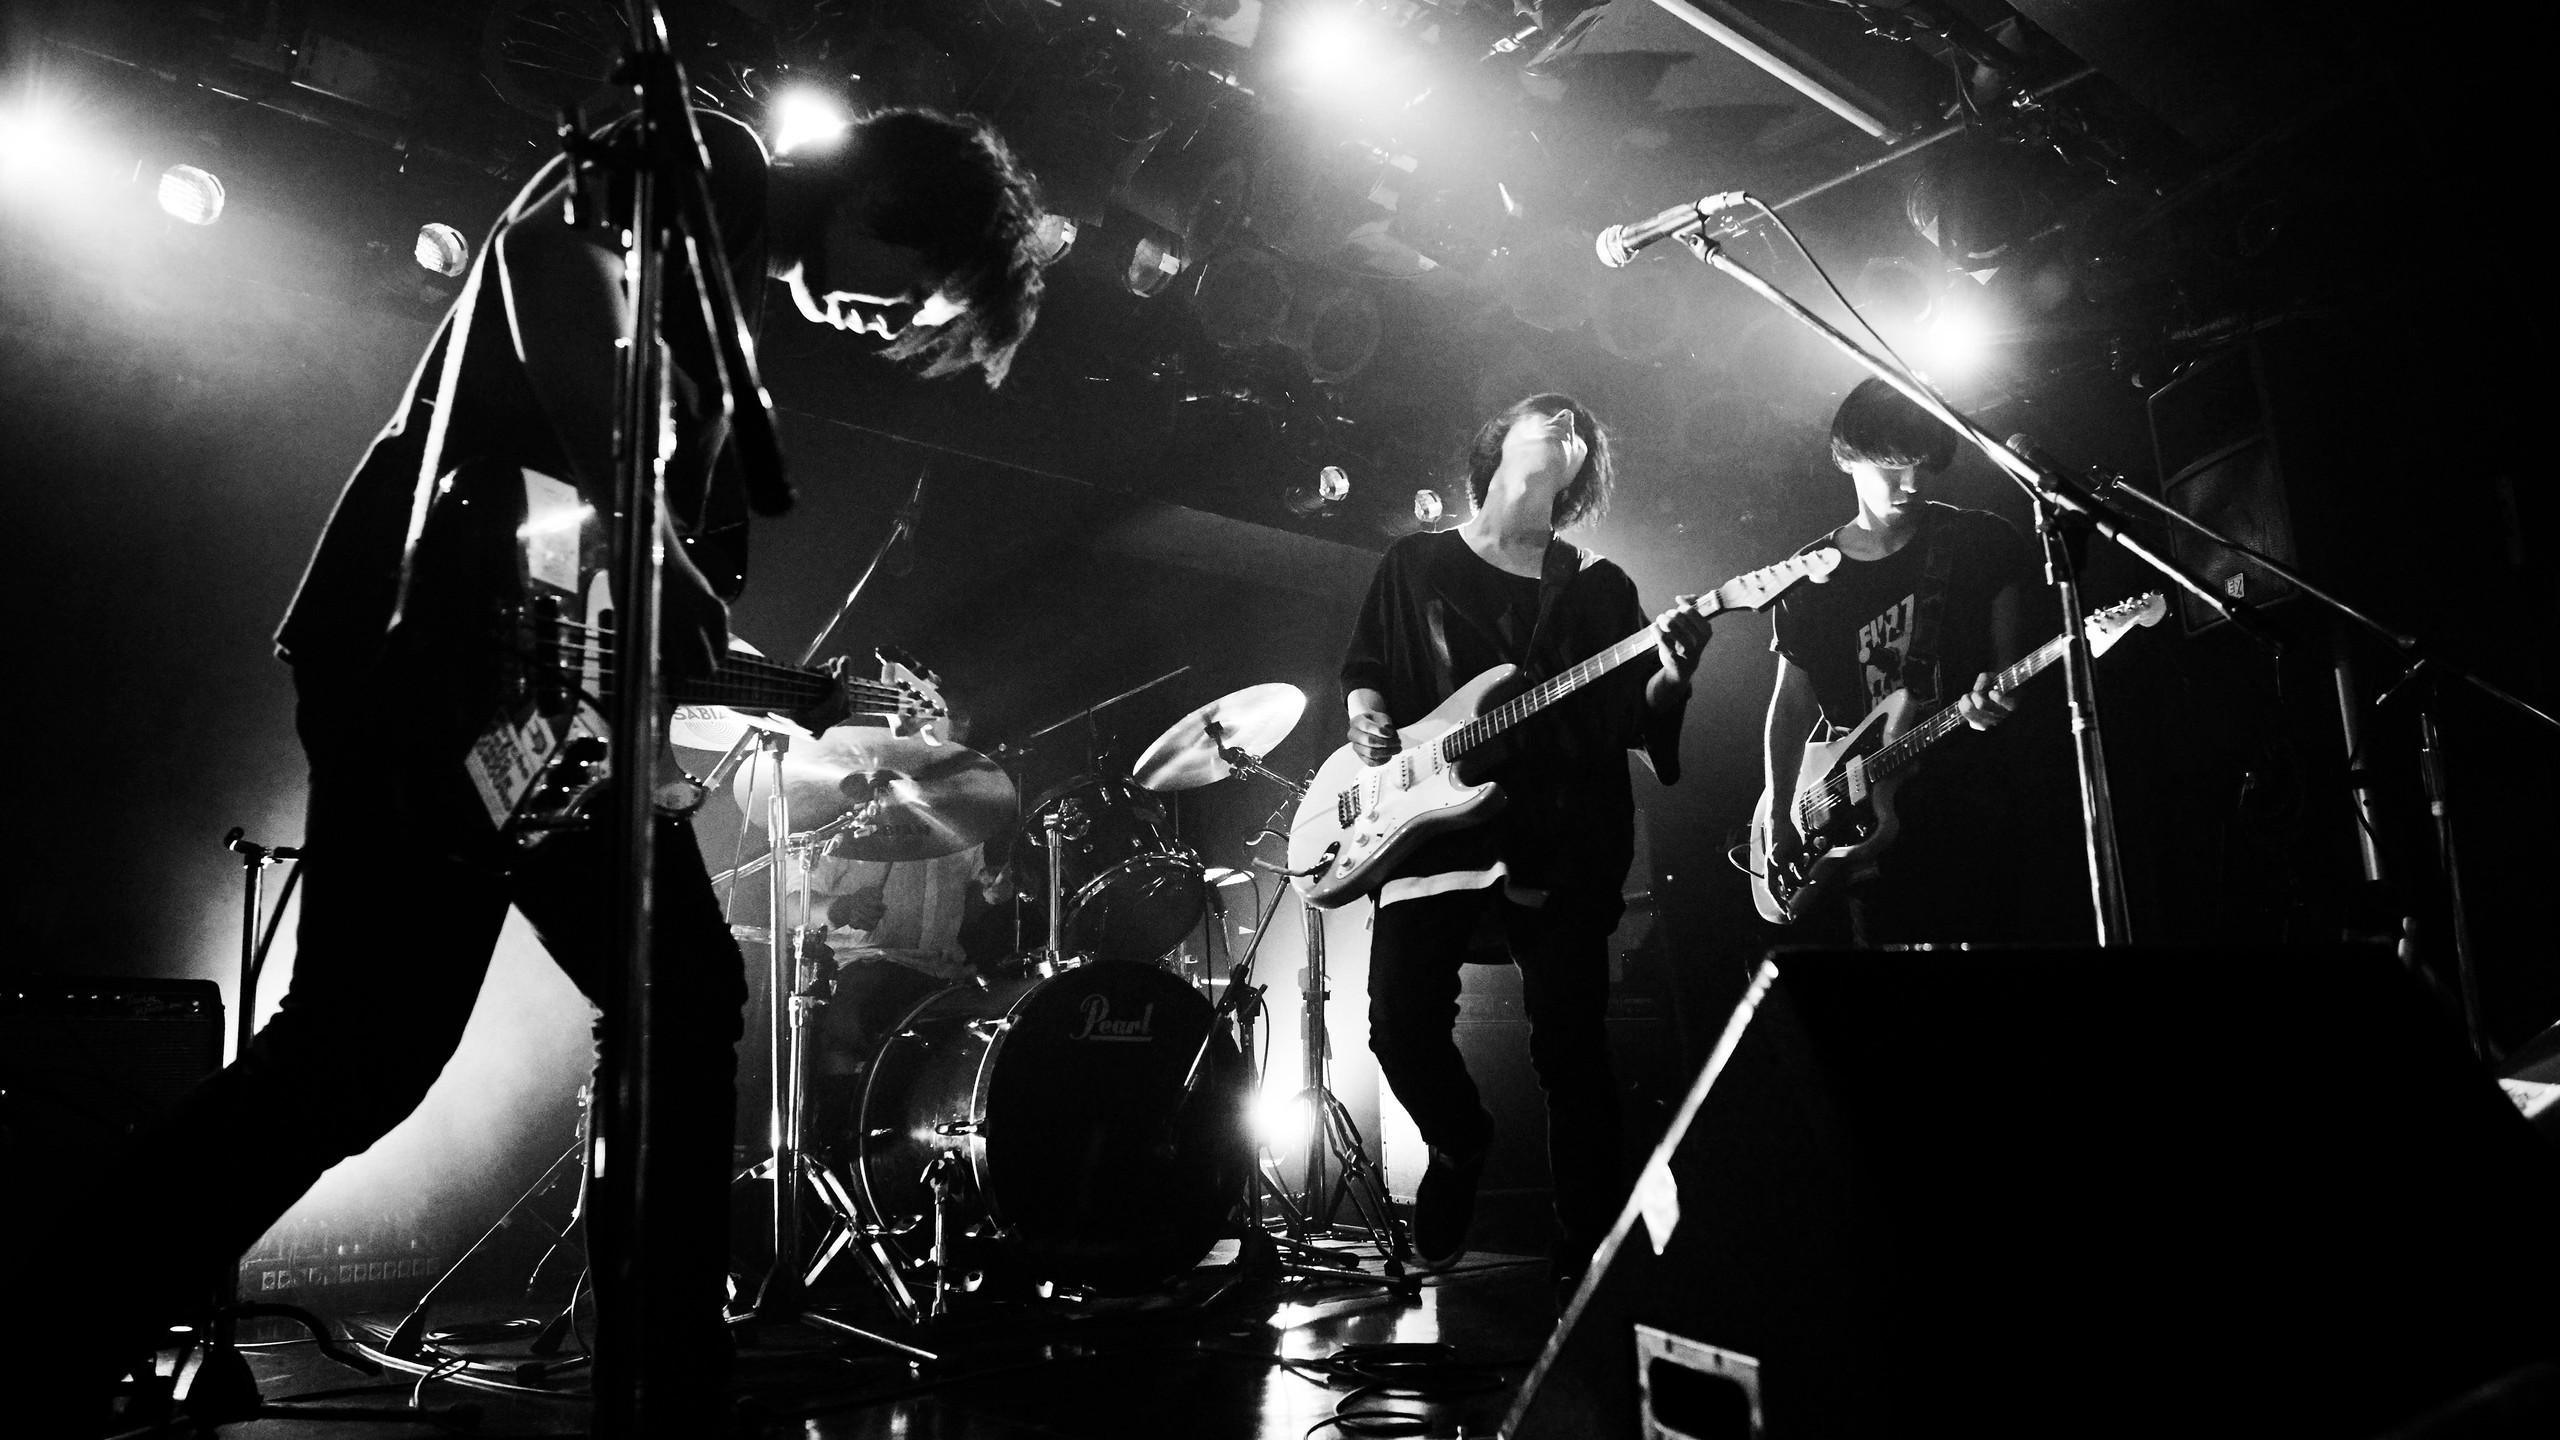 2016/07/24@渋谷club乙